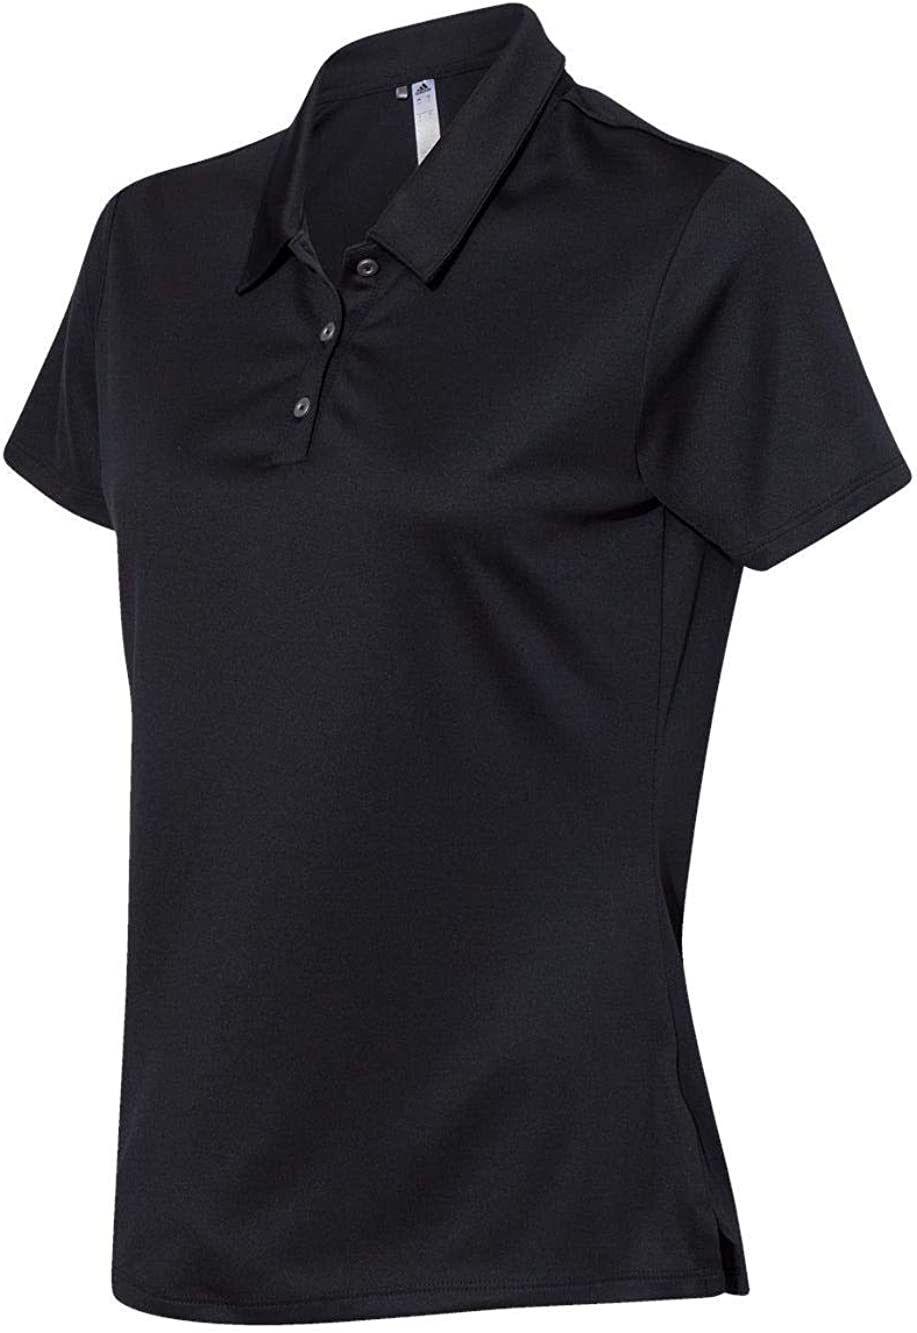 High order Detroit Mall adidas Womens Performance Sport A231 Shirt -XL -Black